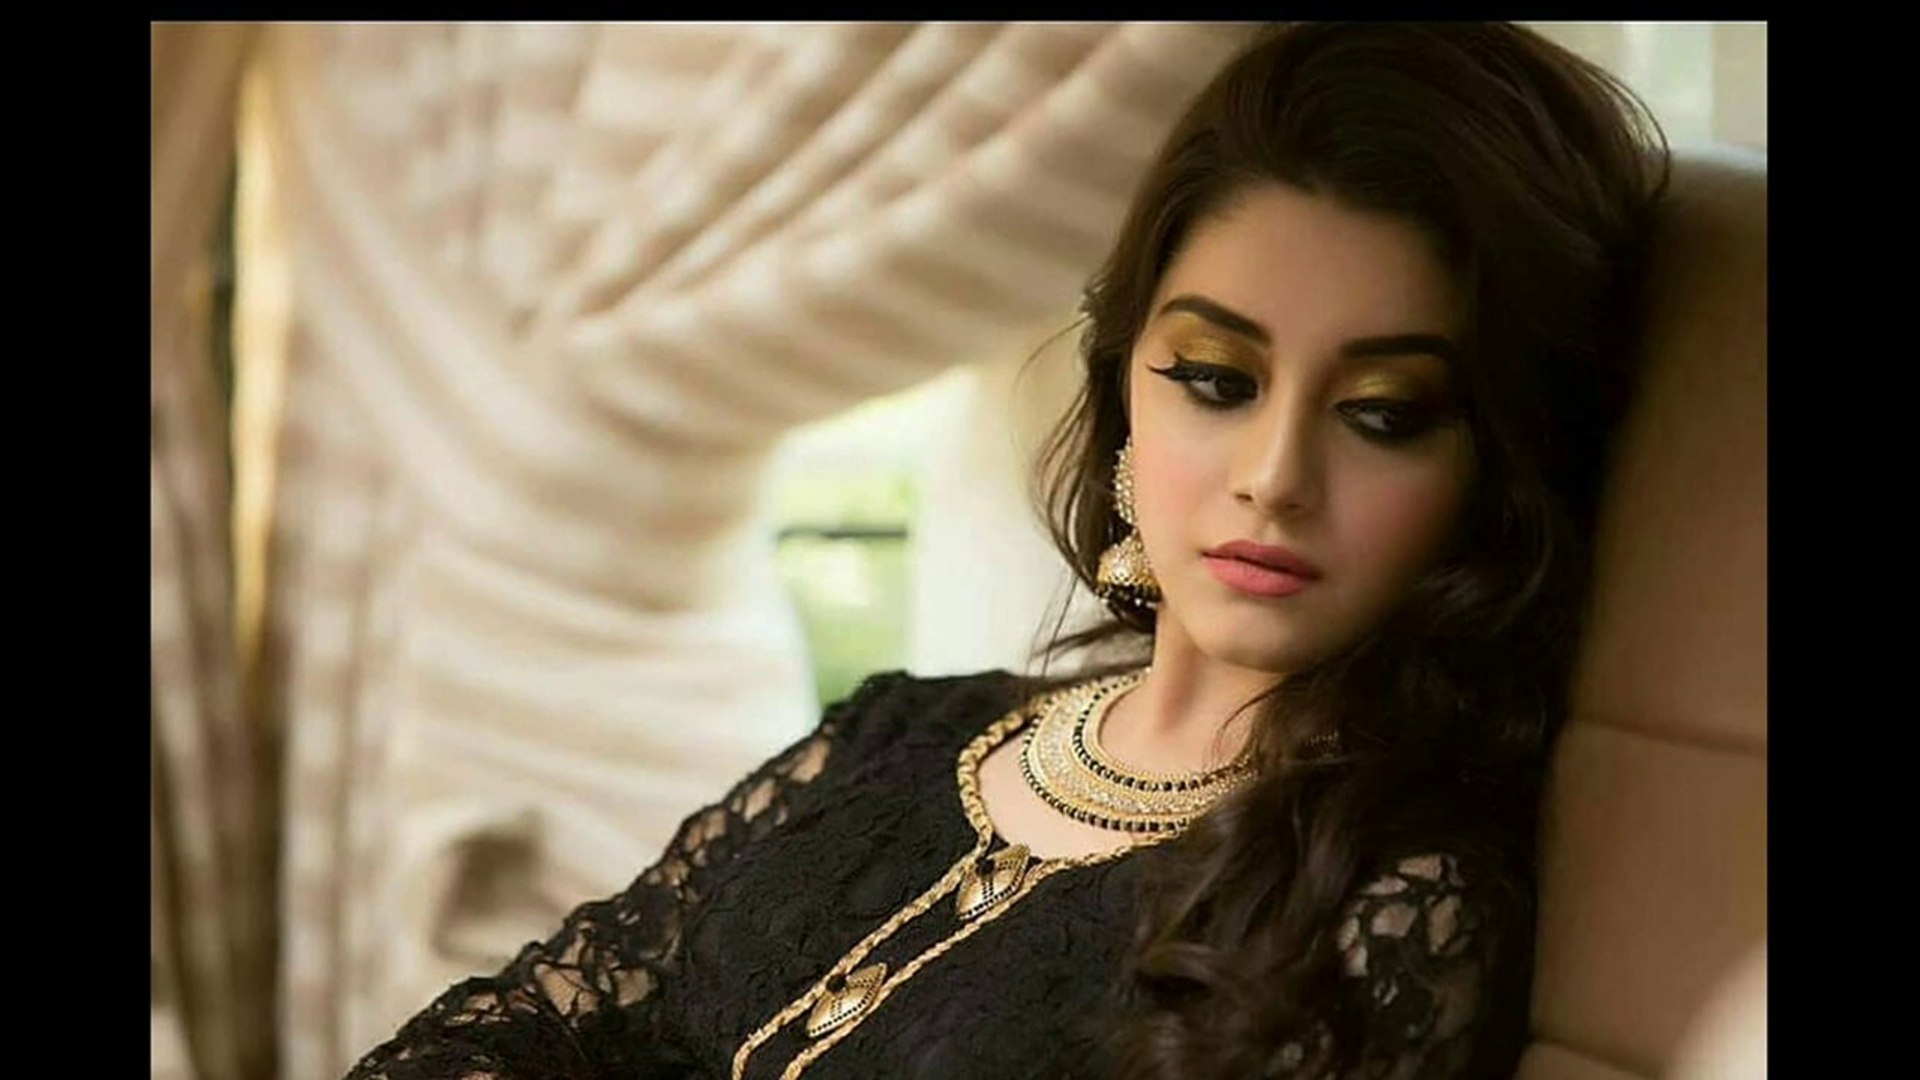 New Faces Took Over Pakistani Showbiz in 2018 - OyeYeah